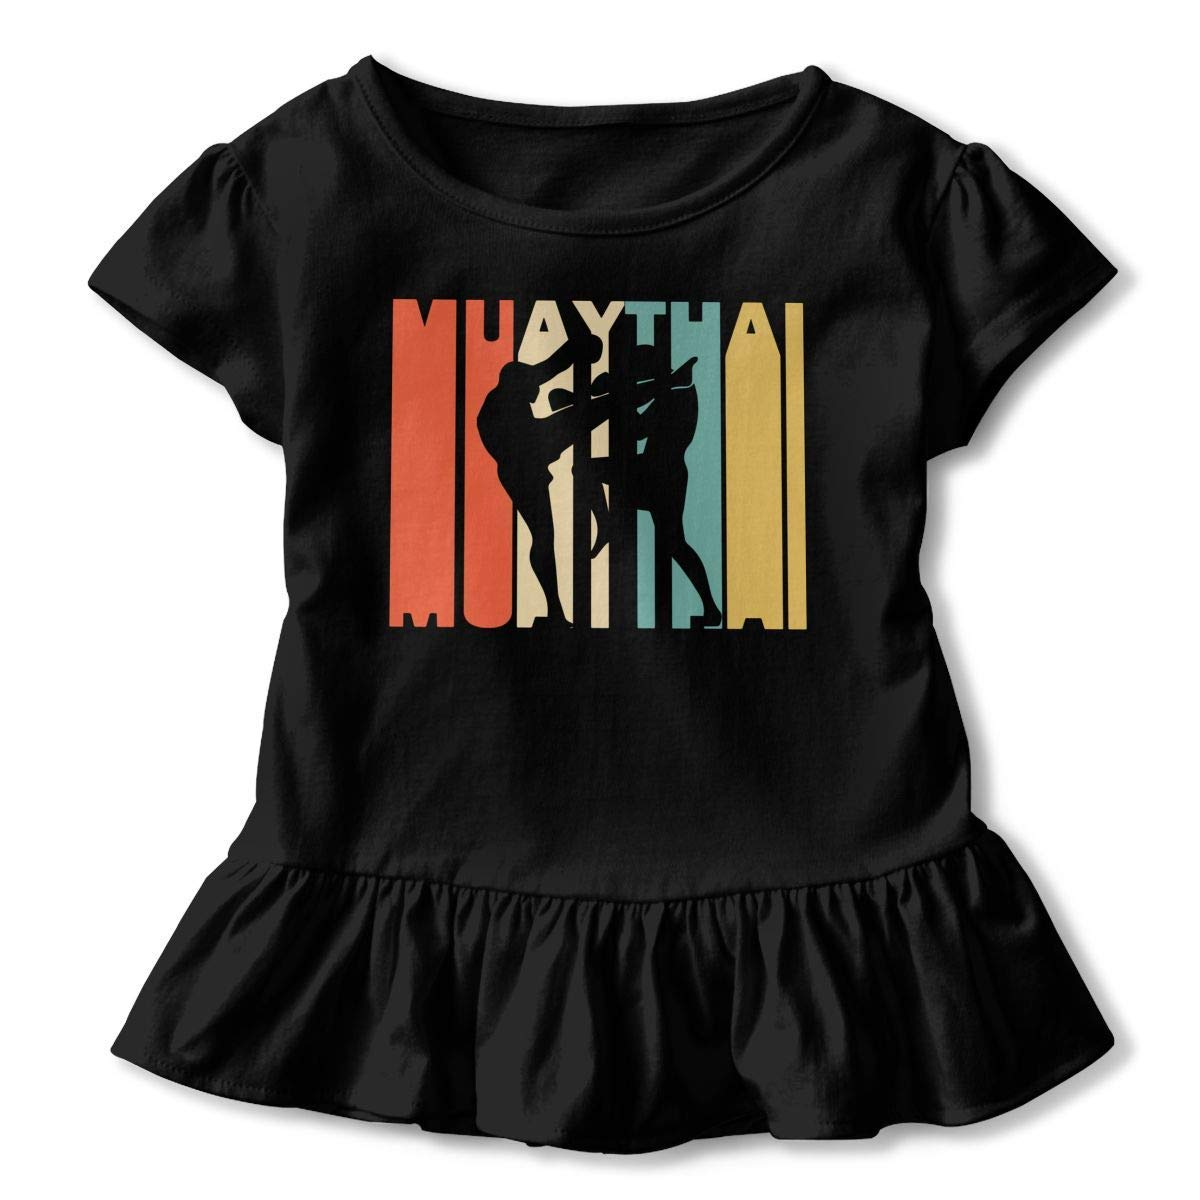 2-6T Short Sleeve Retro Style Muay Thai Silhouette T-Shirts for Children Ruffled Tunic Tops with Falbala